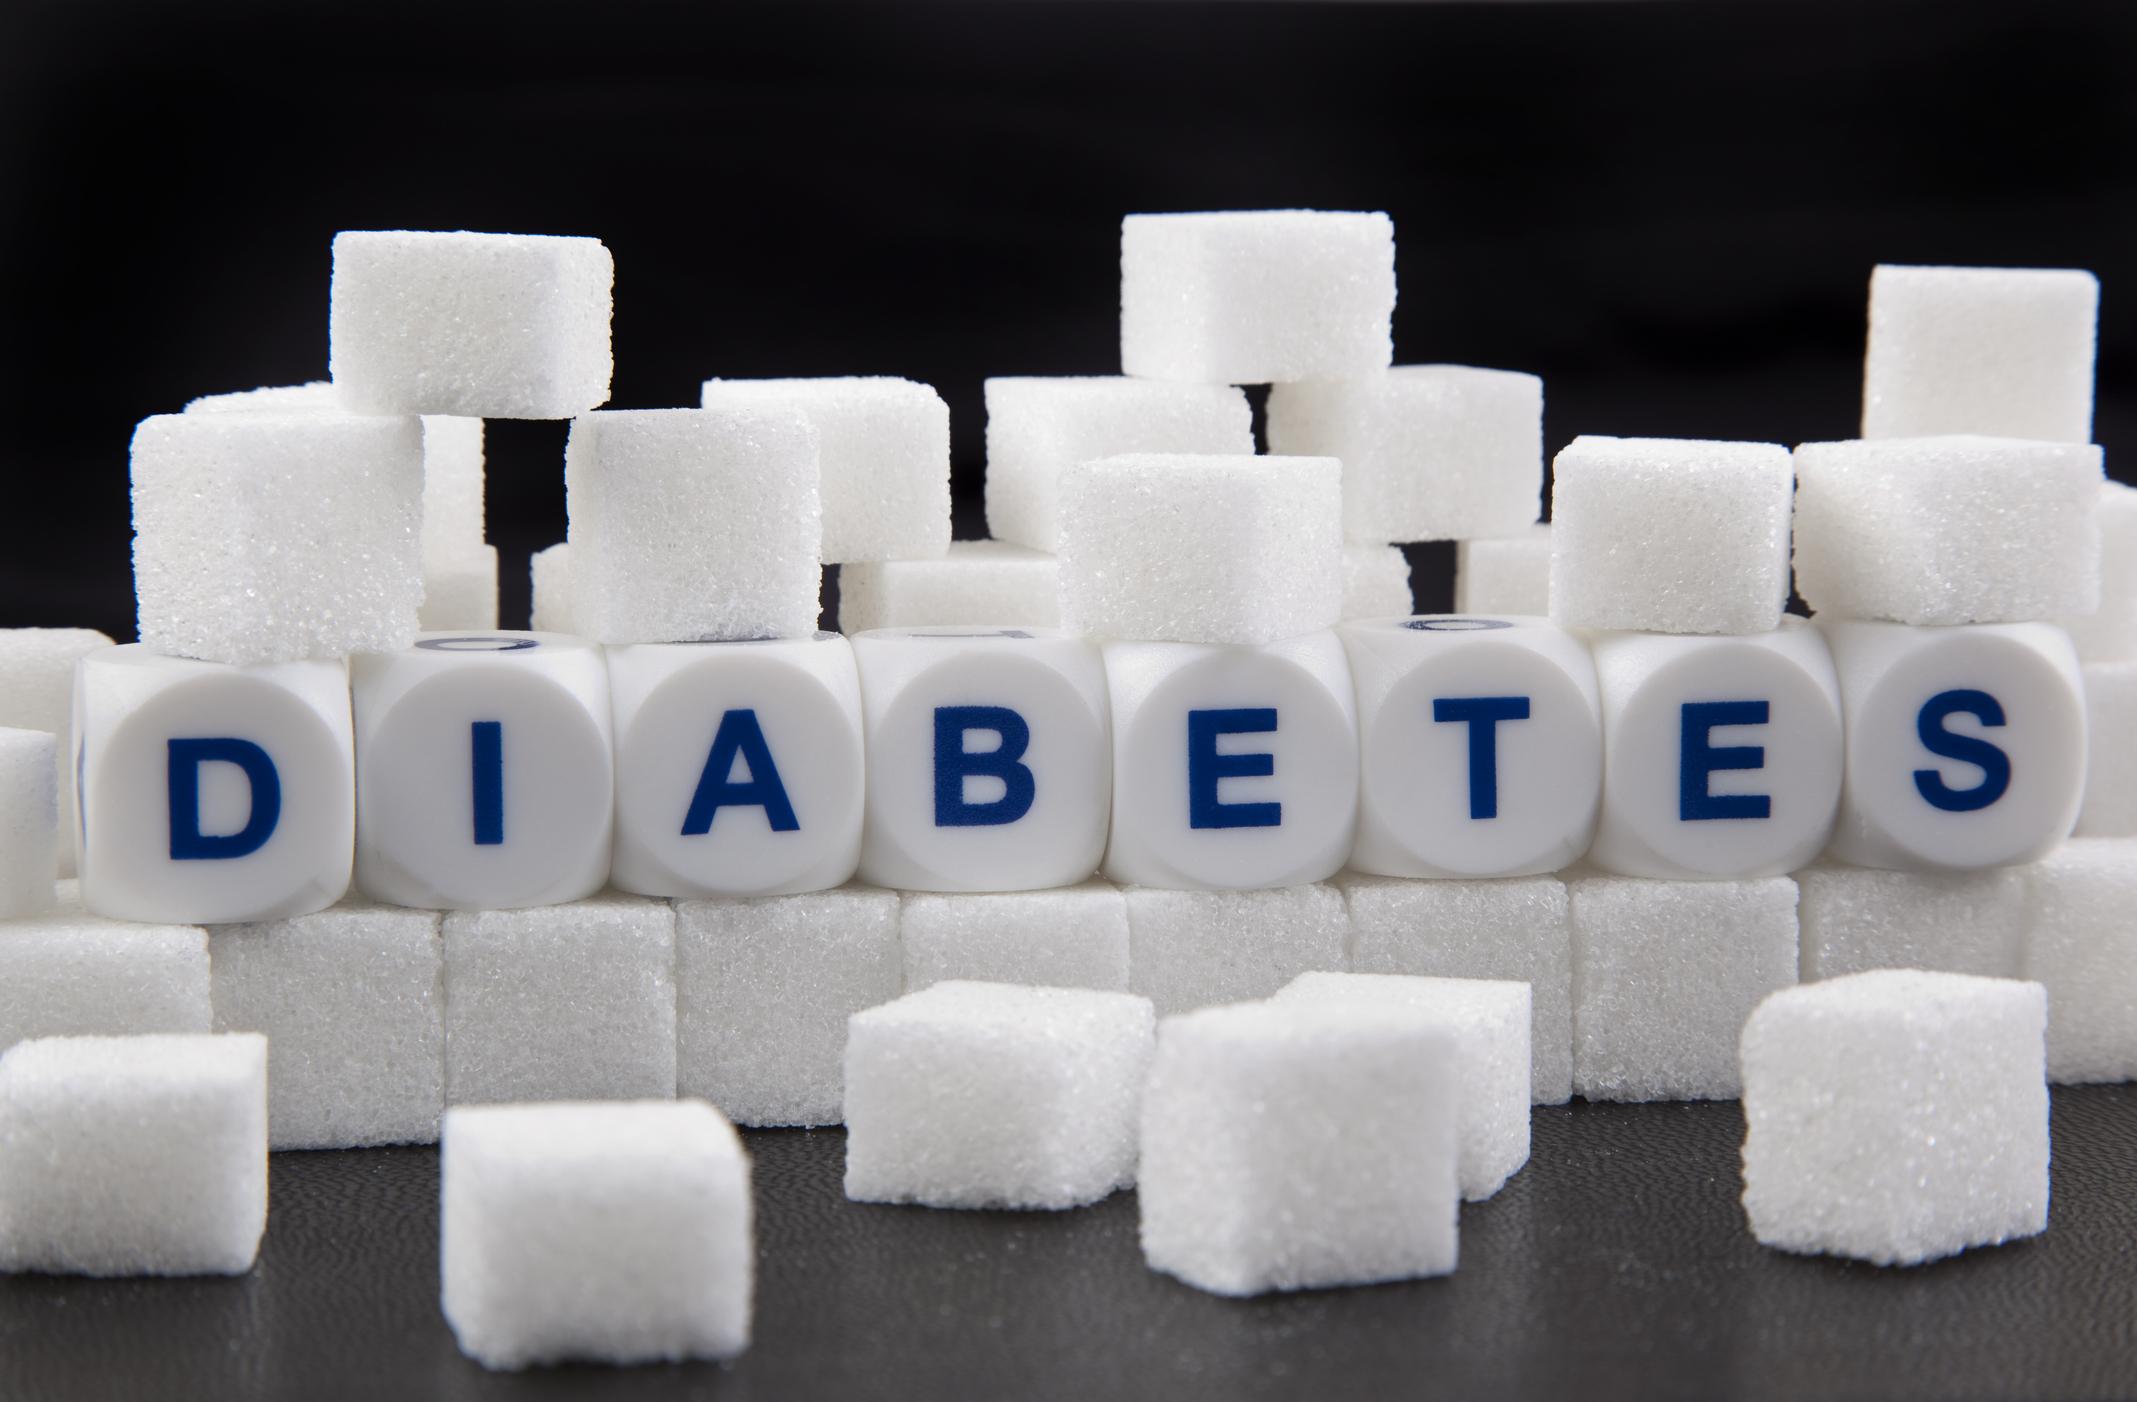 diabetes - چگونه می توان با یک برنامه غذایی 7 روزه دیابت را کنترل کرد؟